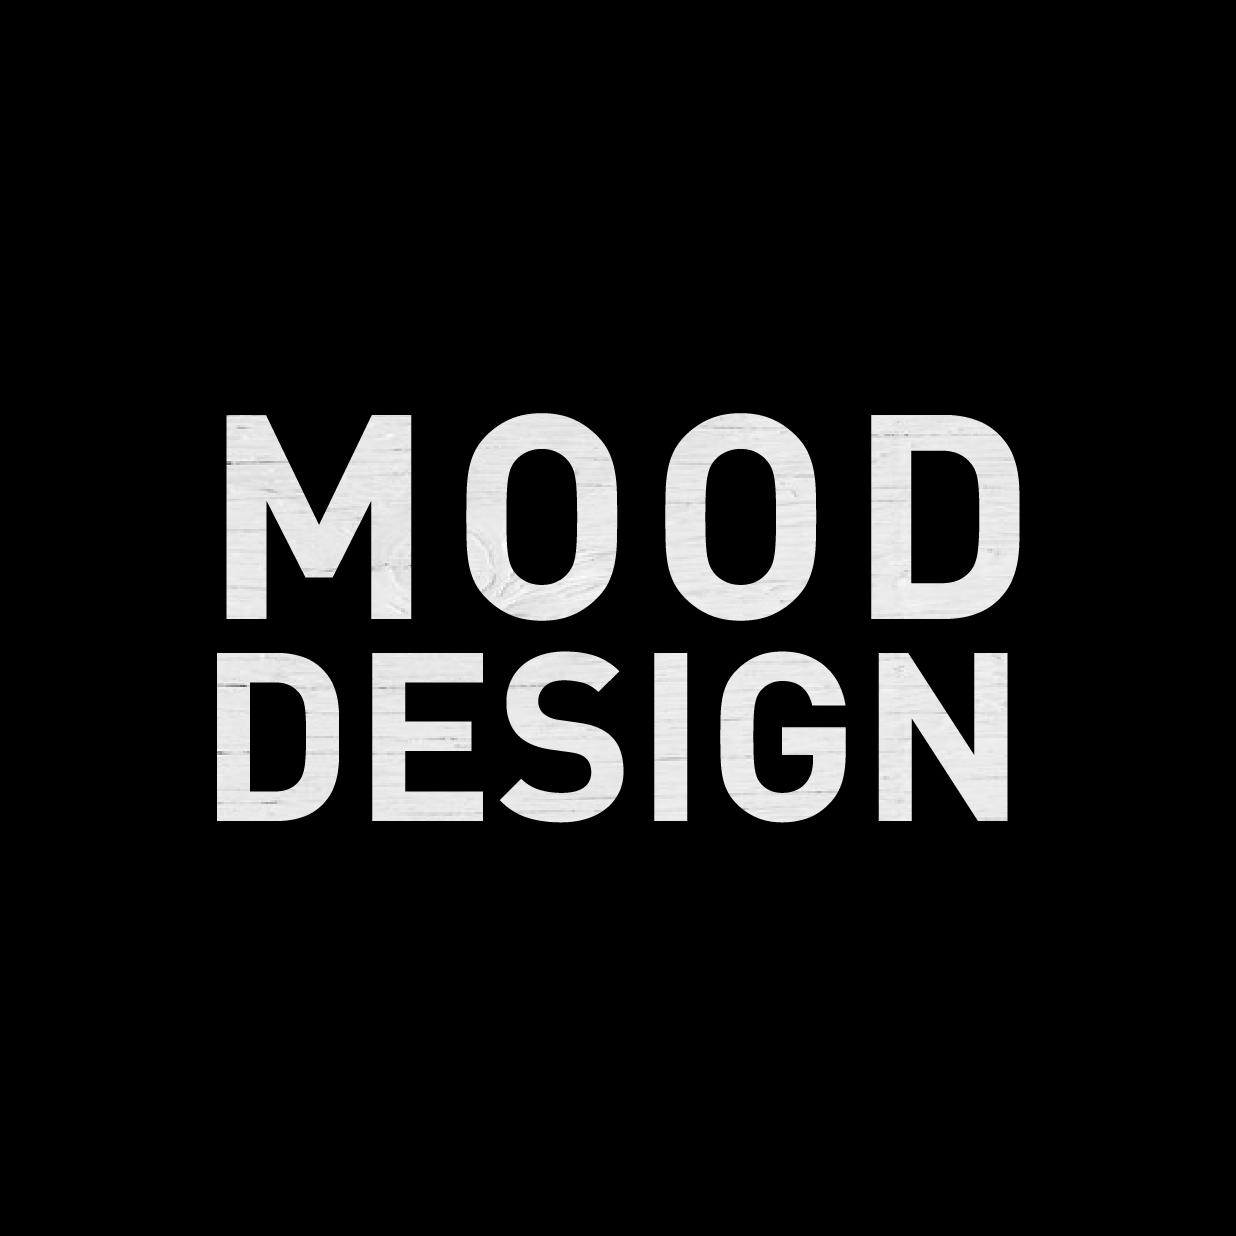 MOOD DESIGN